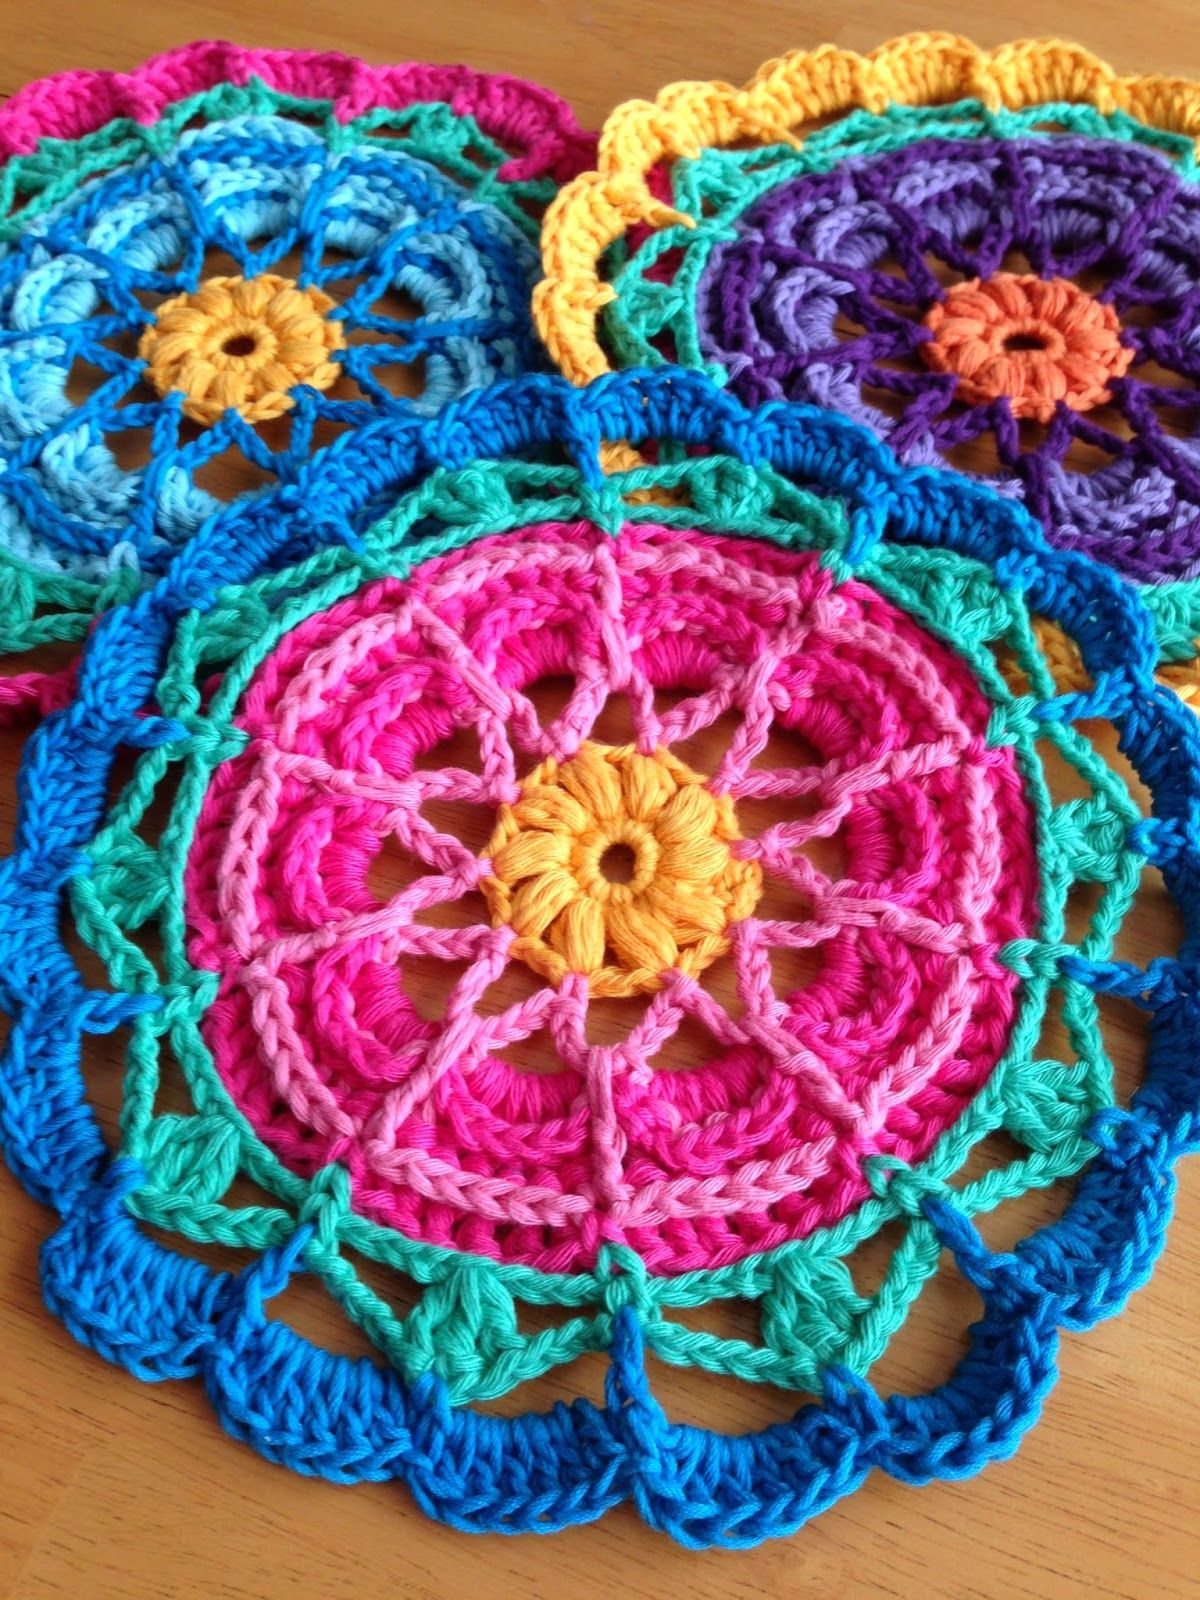 Yfp32 eyeloveknots yarn favorite from yarn fanatic party 31 yfp eyeloveknots yarn favorite from yarn fanatic party das crochet connection colorful flower mandalas bankloansurffo Images